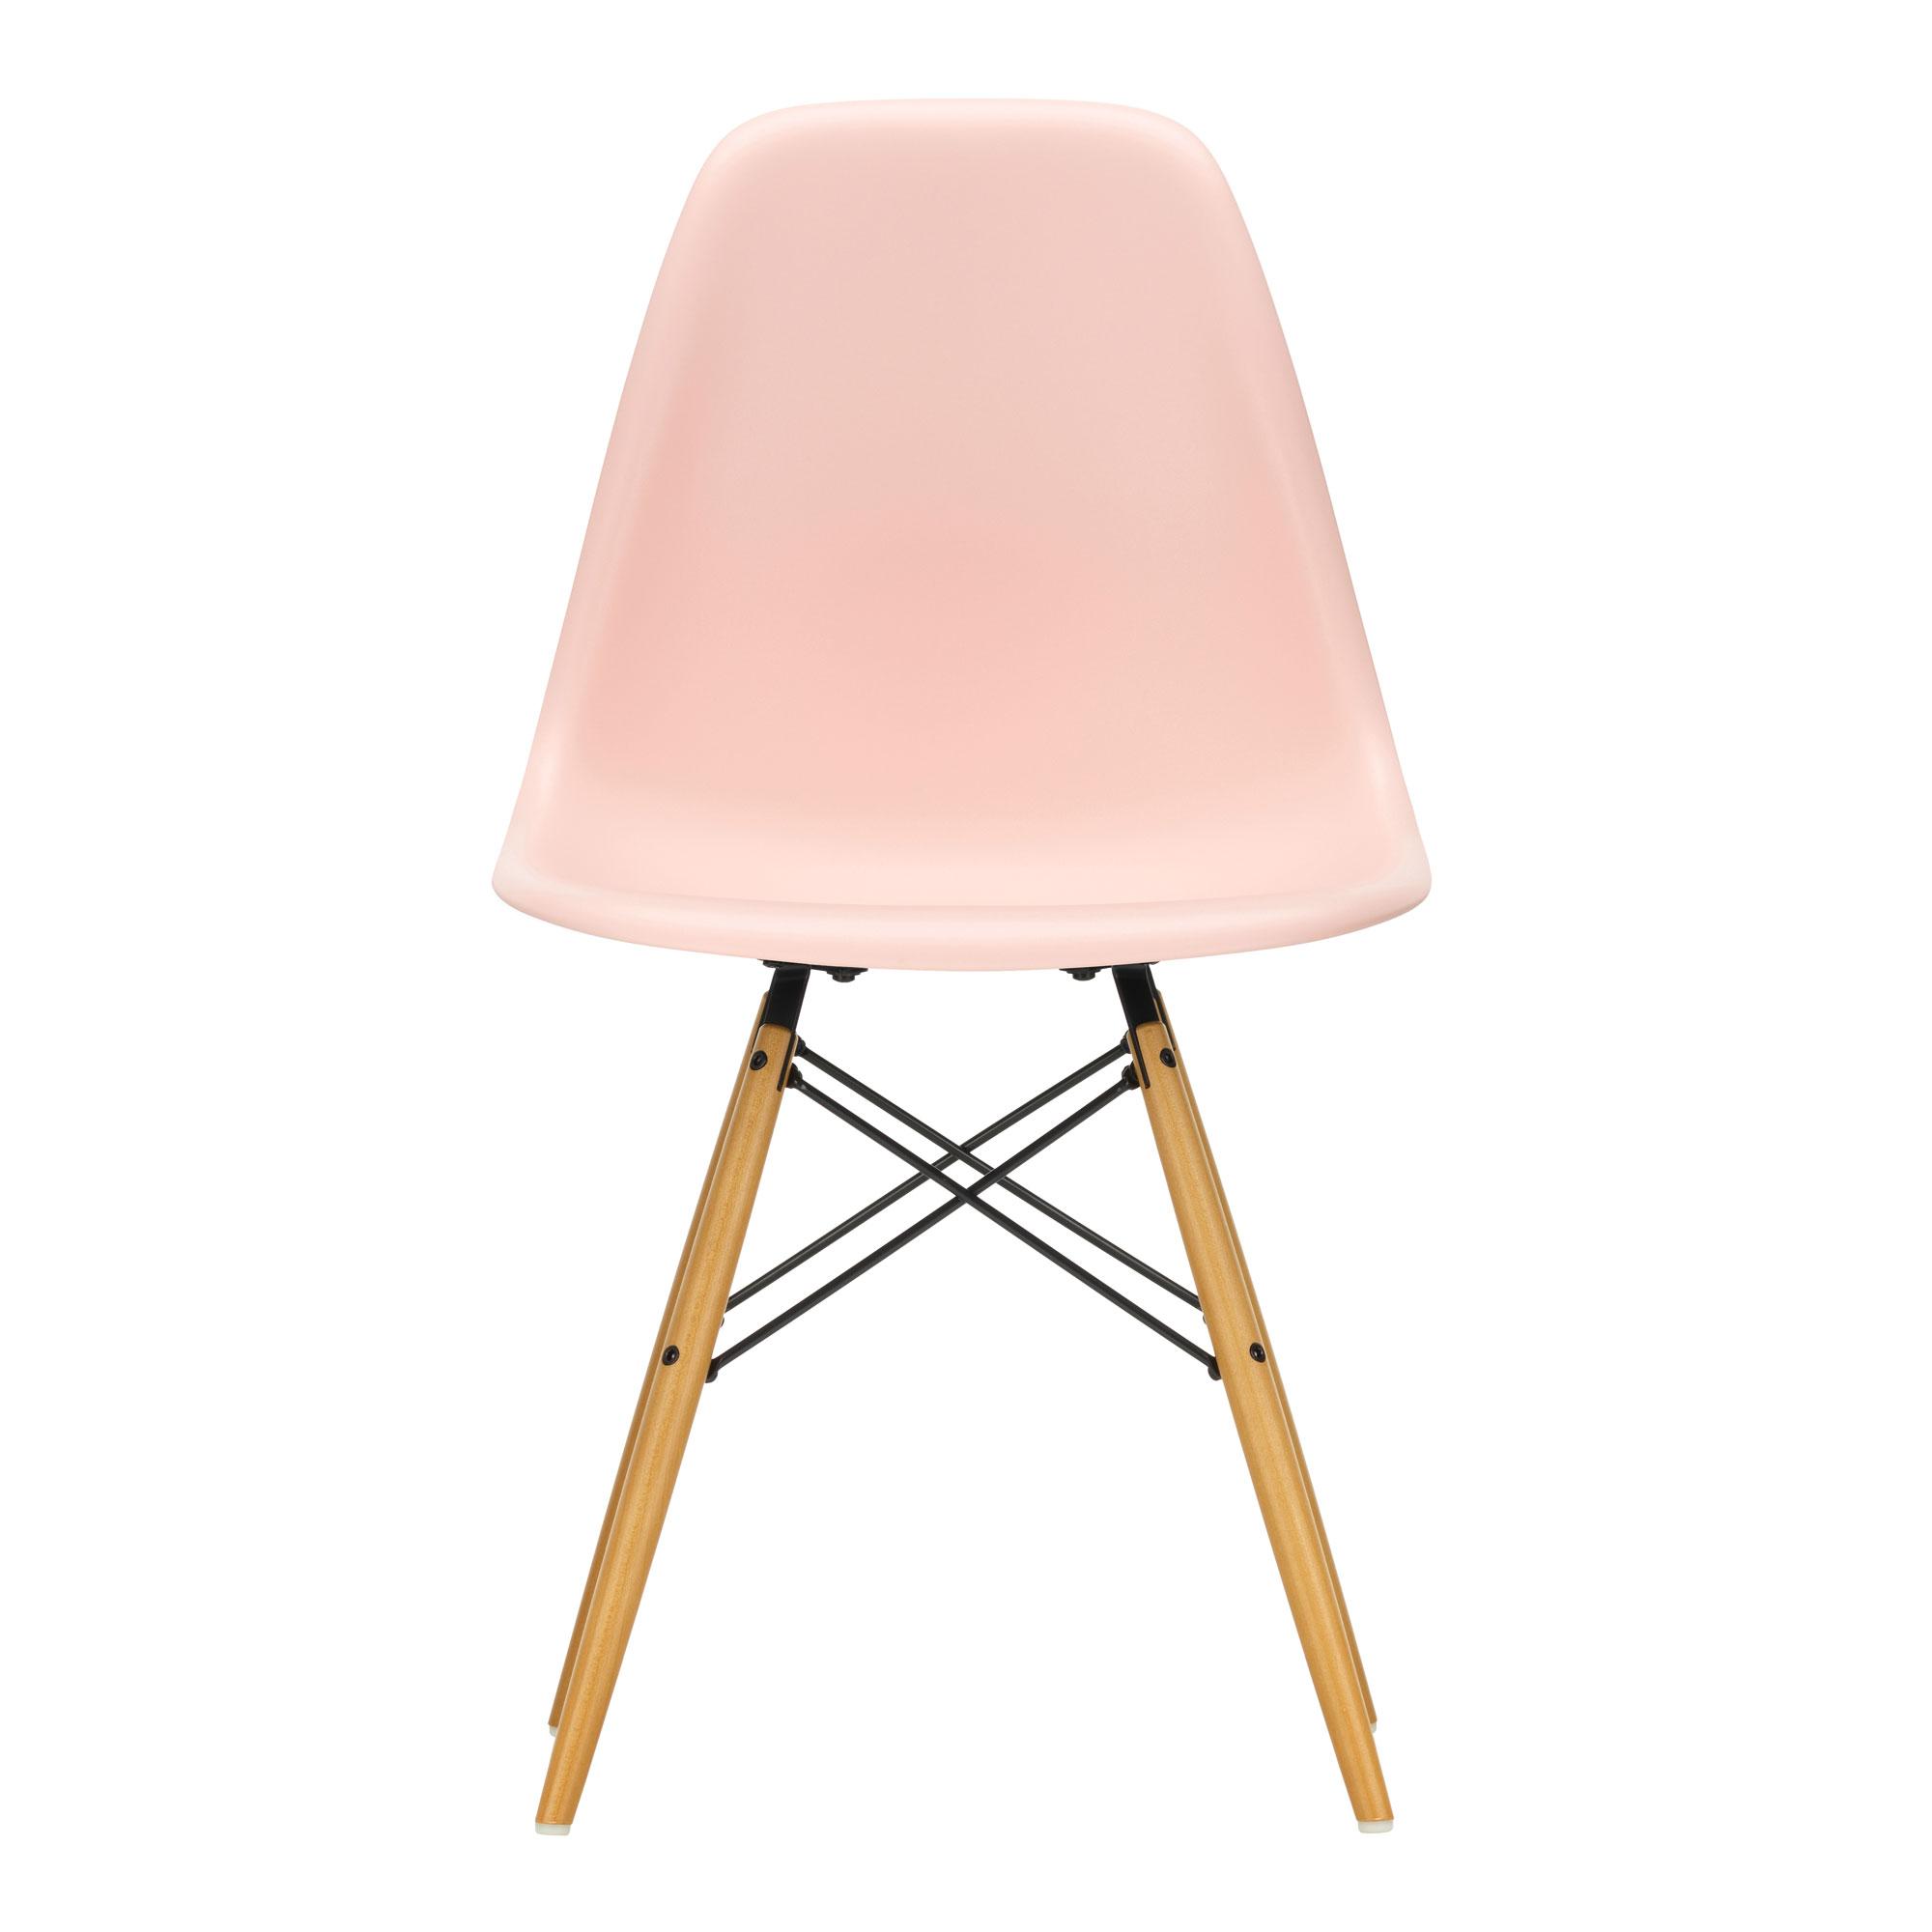 Eames Plastic Side Chair DSW Pale Rose 41 Ash Honey Tone